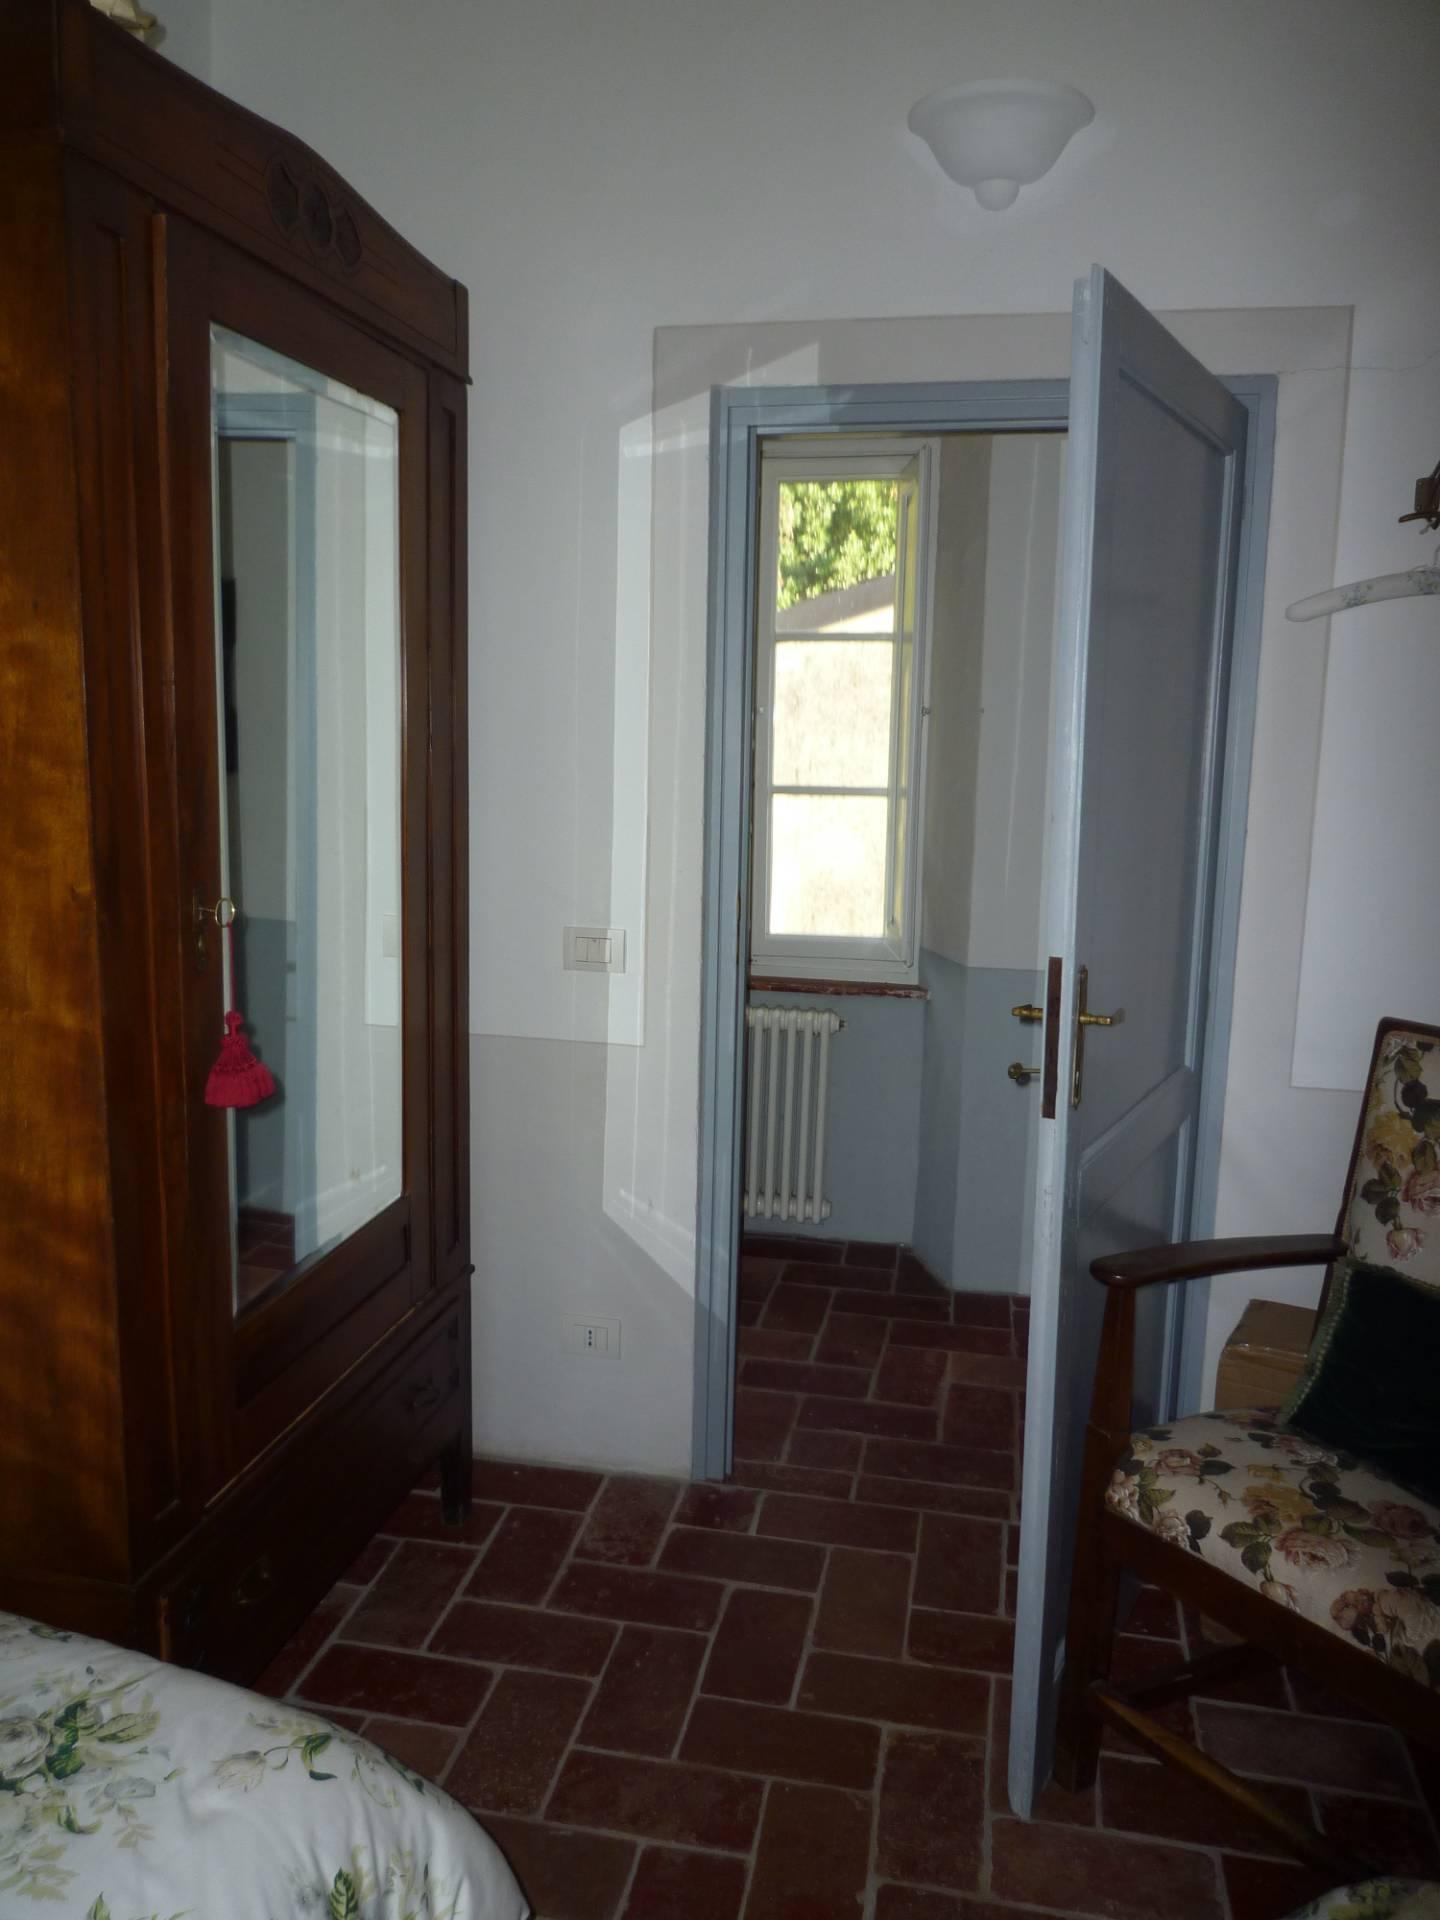 Villa in Vendita a Camaiore: 5 locali, 120 mq - Foto 25